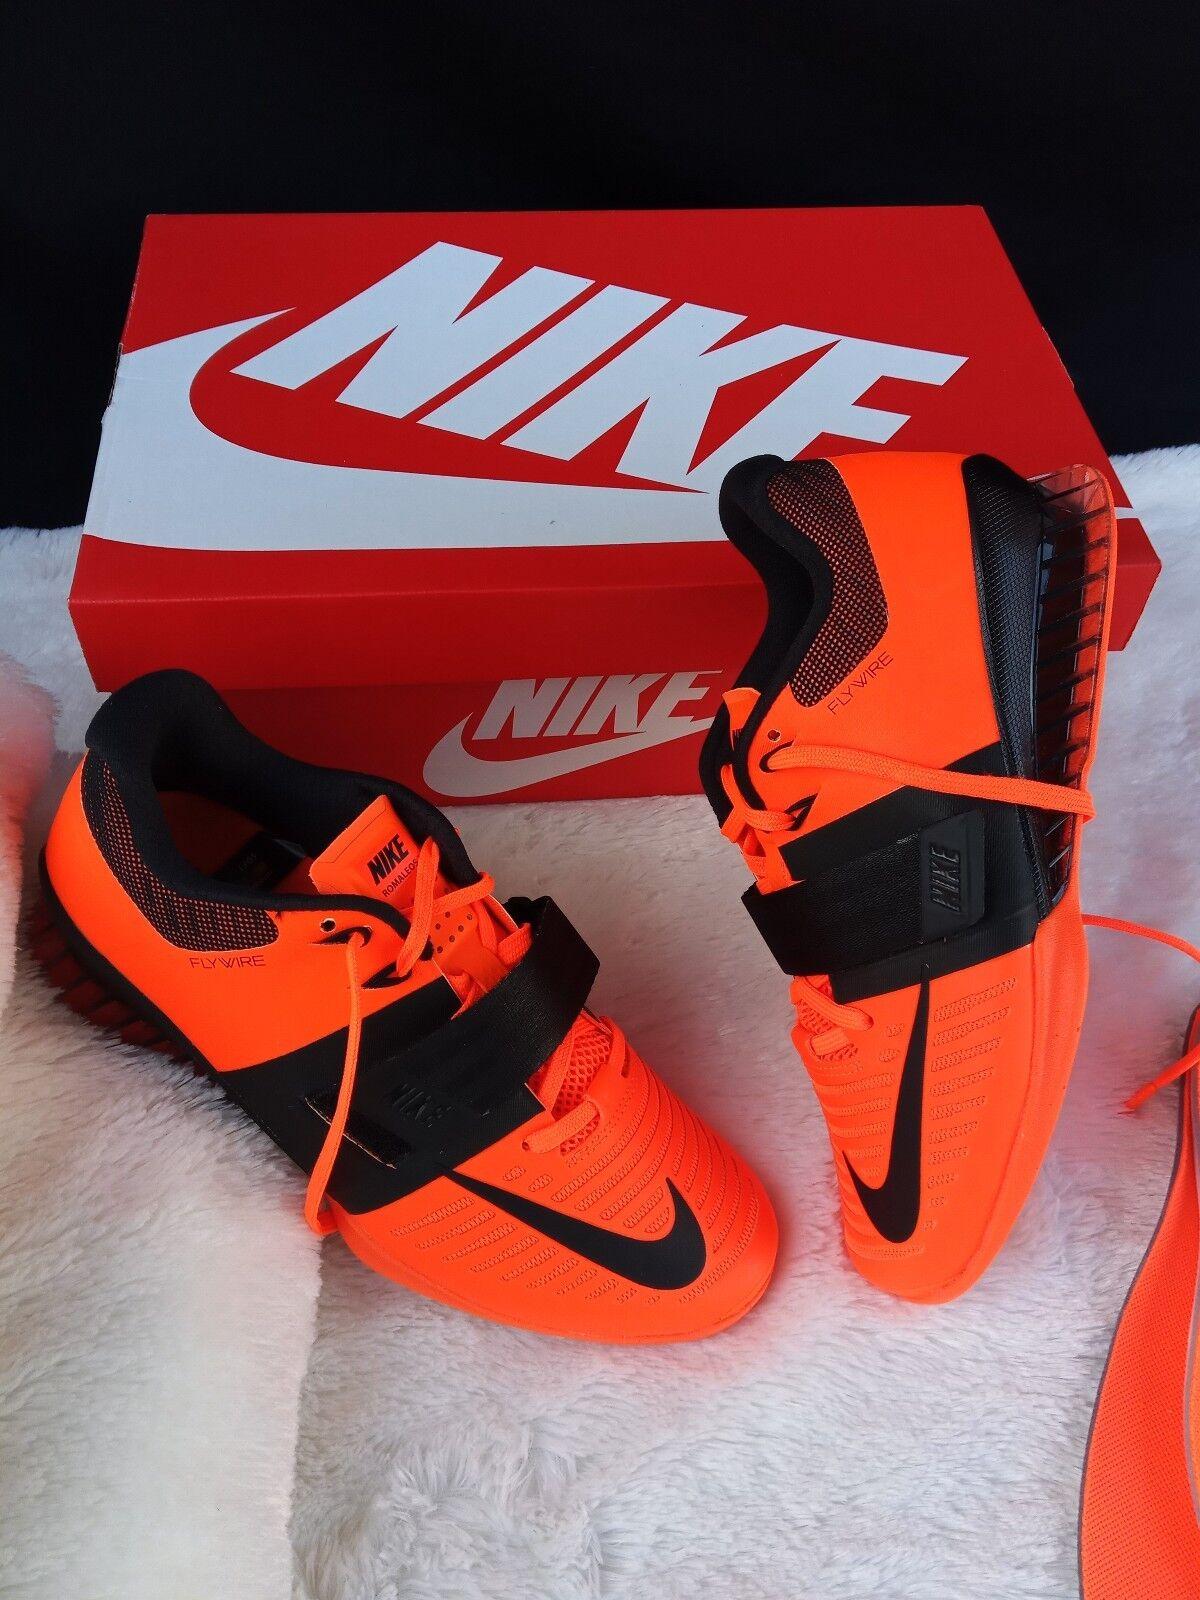 10 MENS Nike Romaleos 3 orange neon black  Training Weightlifting GYM 852933 801